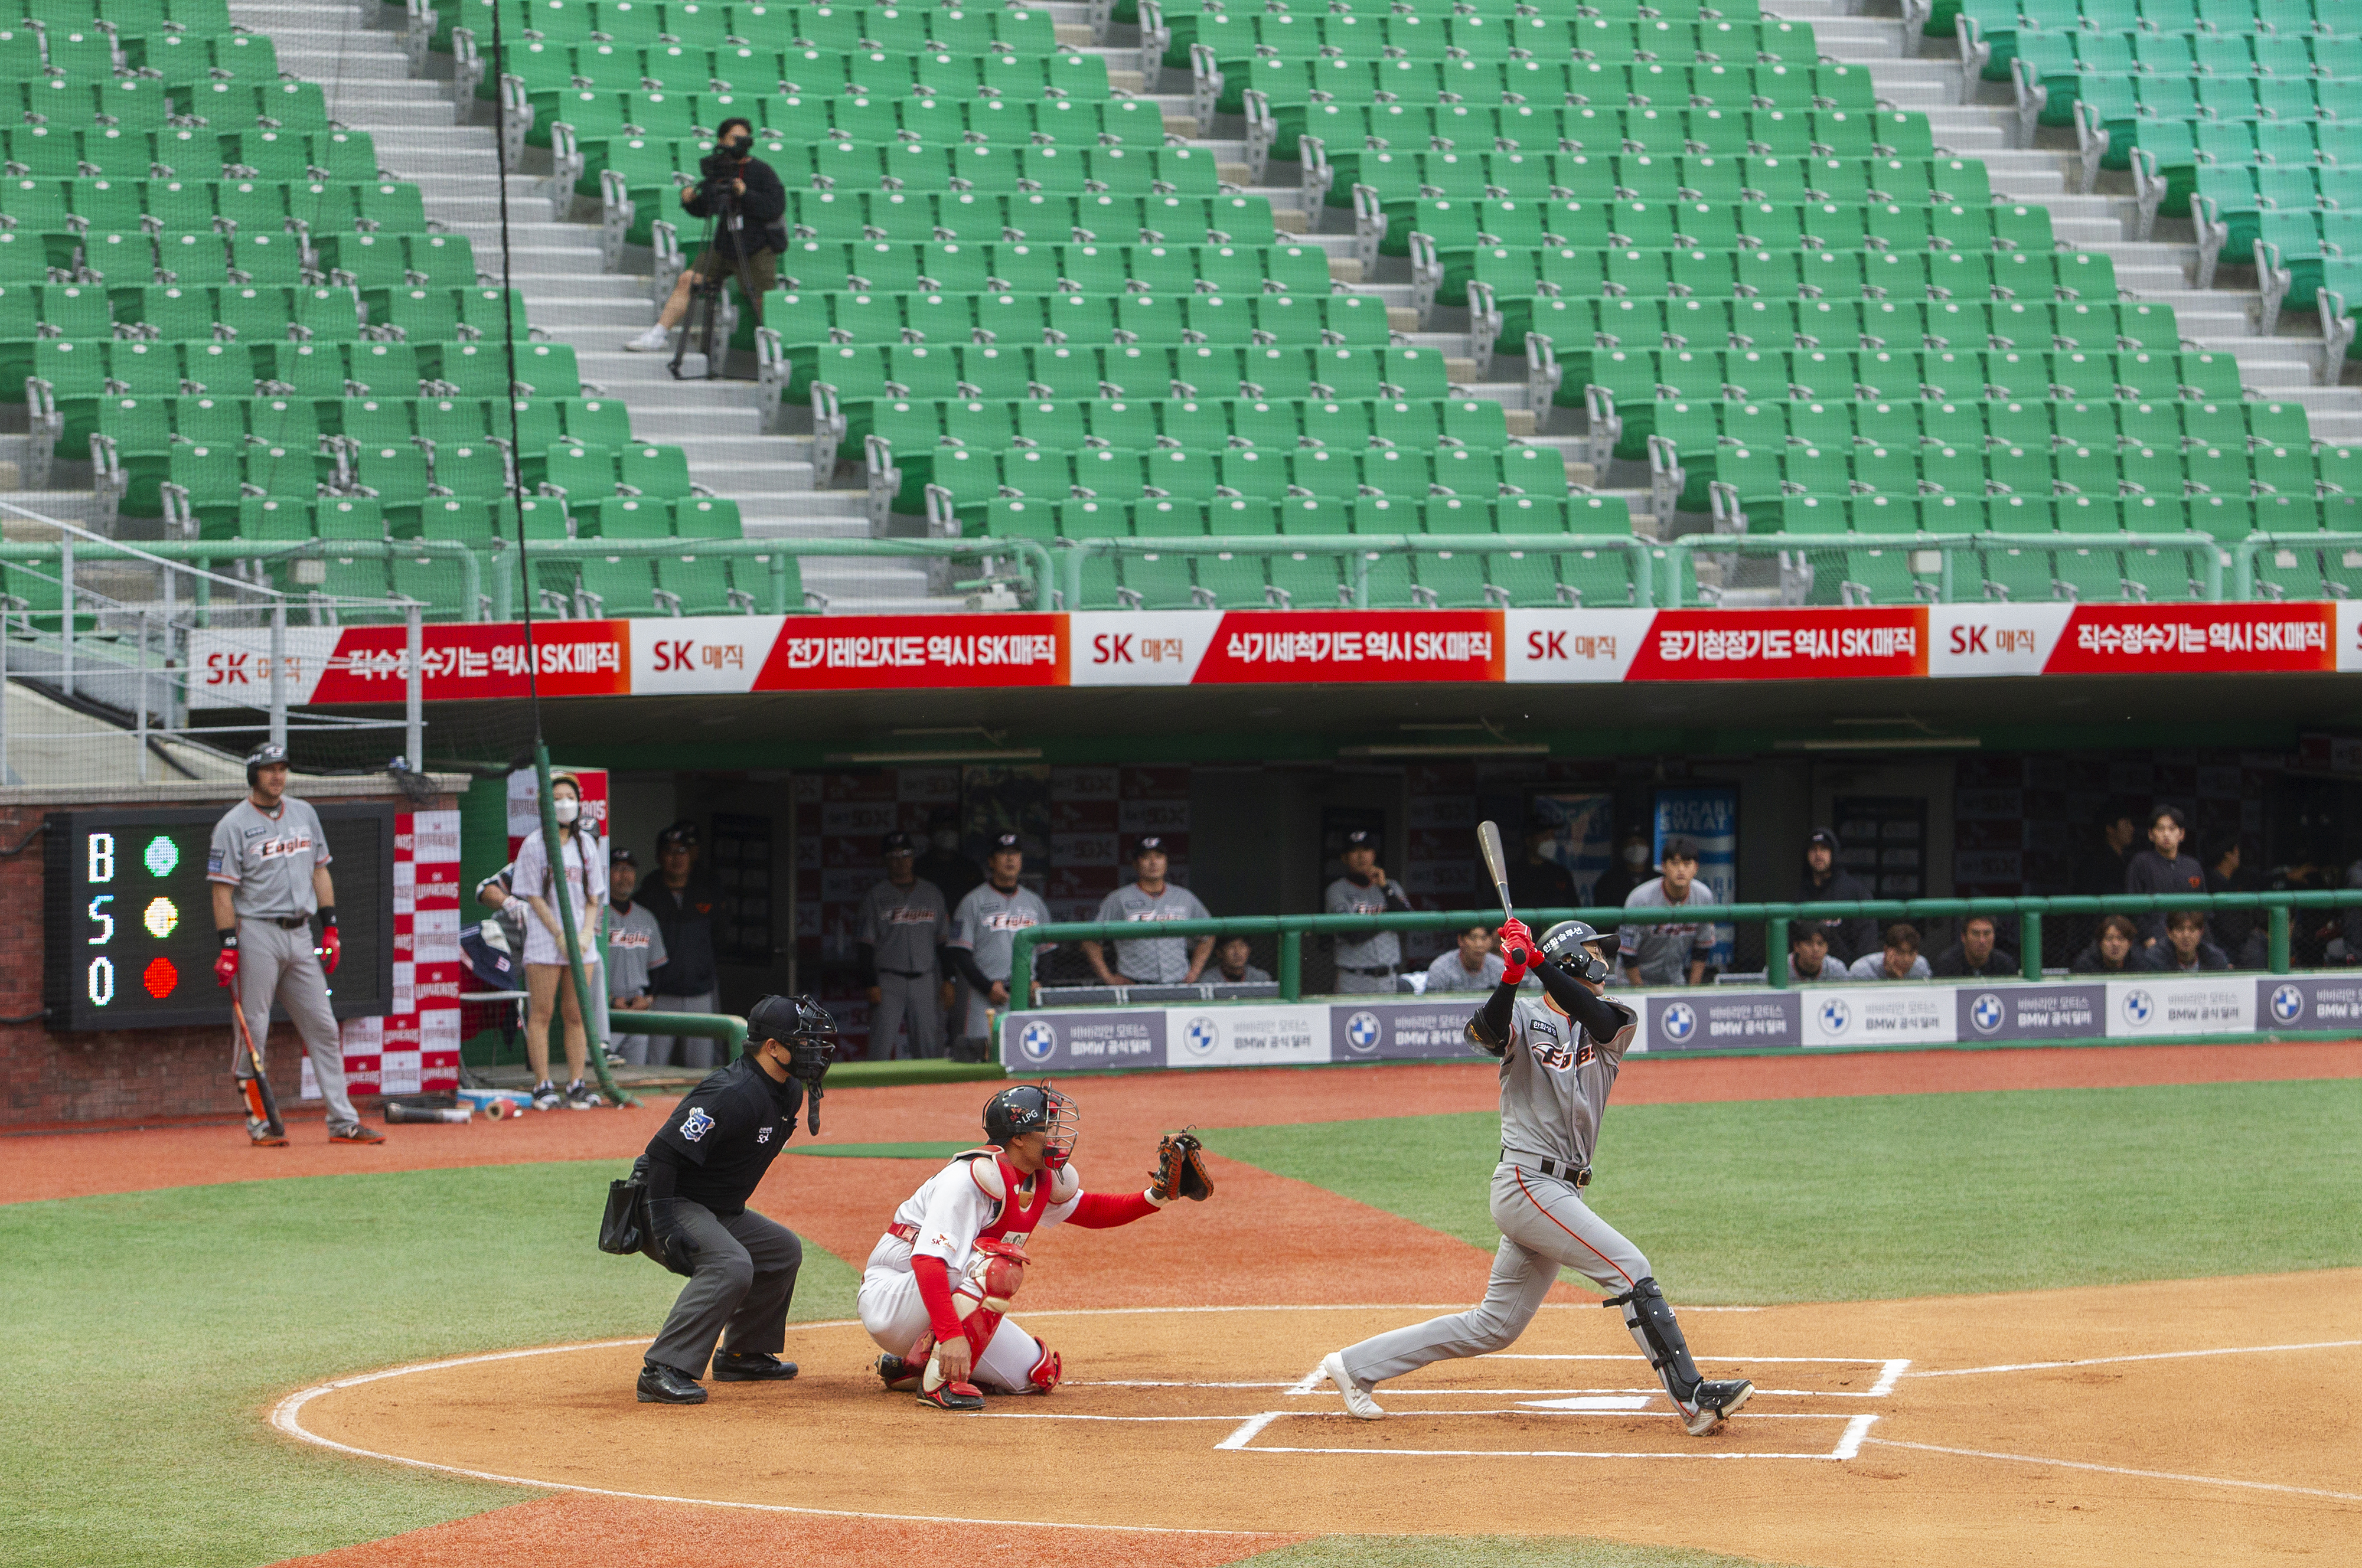 Baseball season resumes in South Korea without spectators